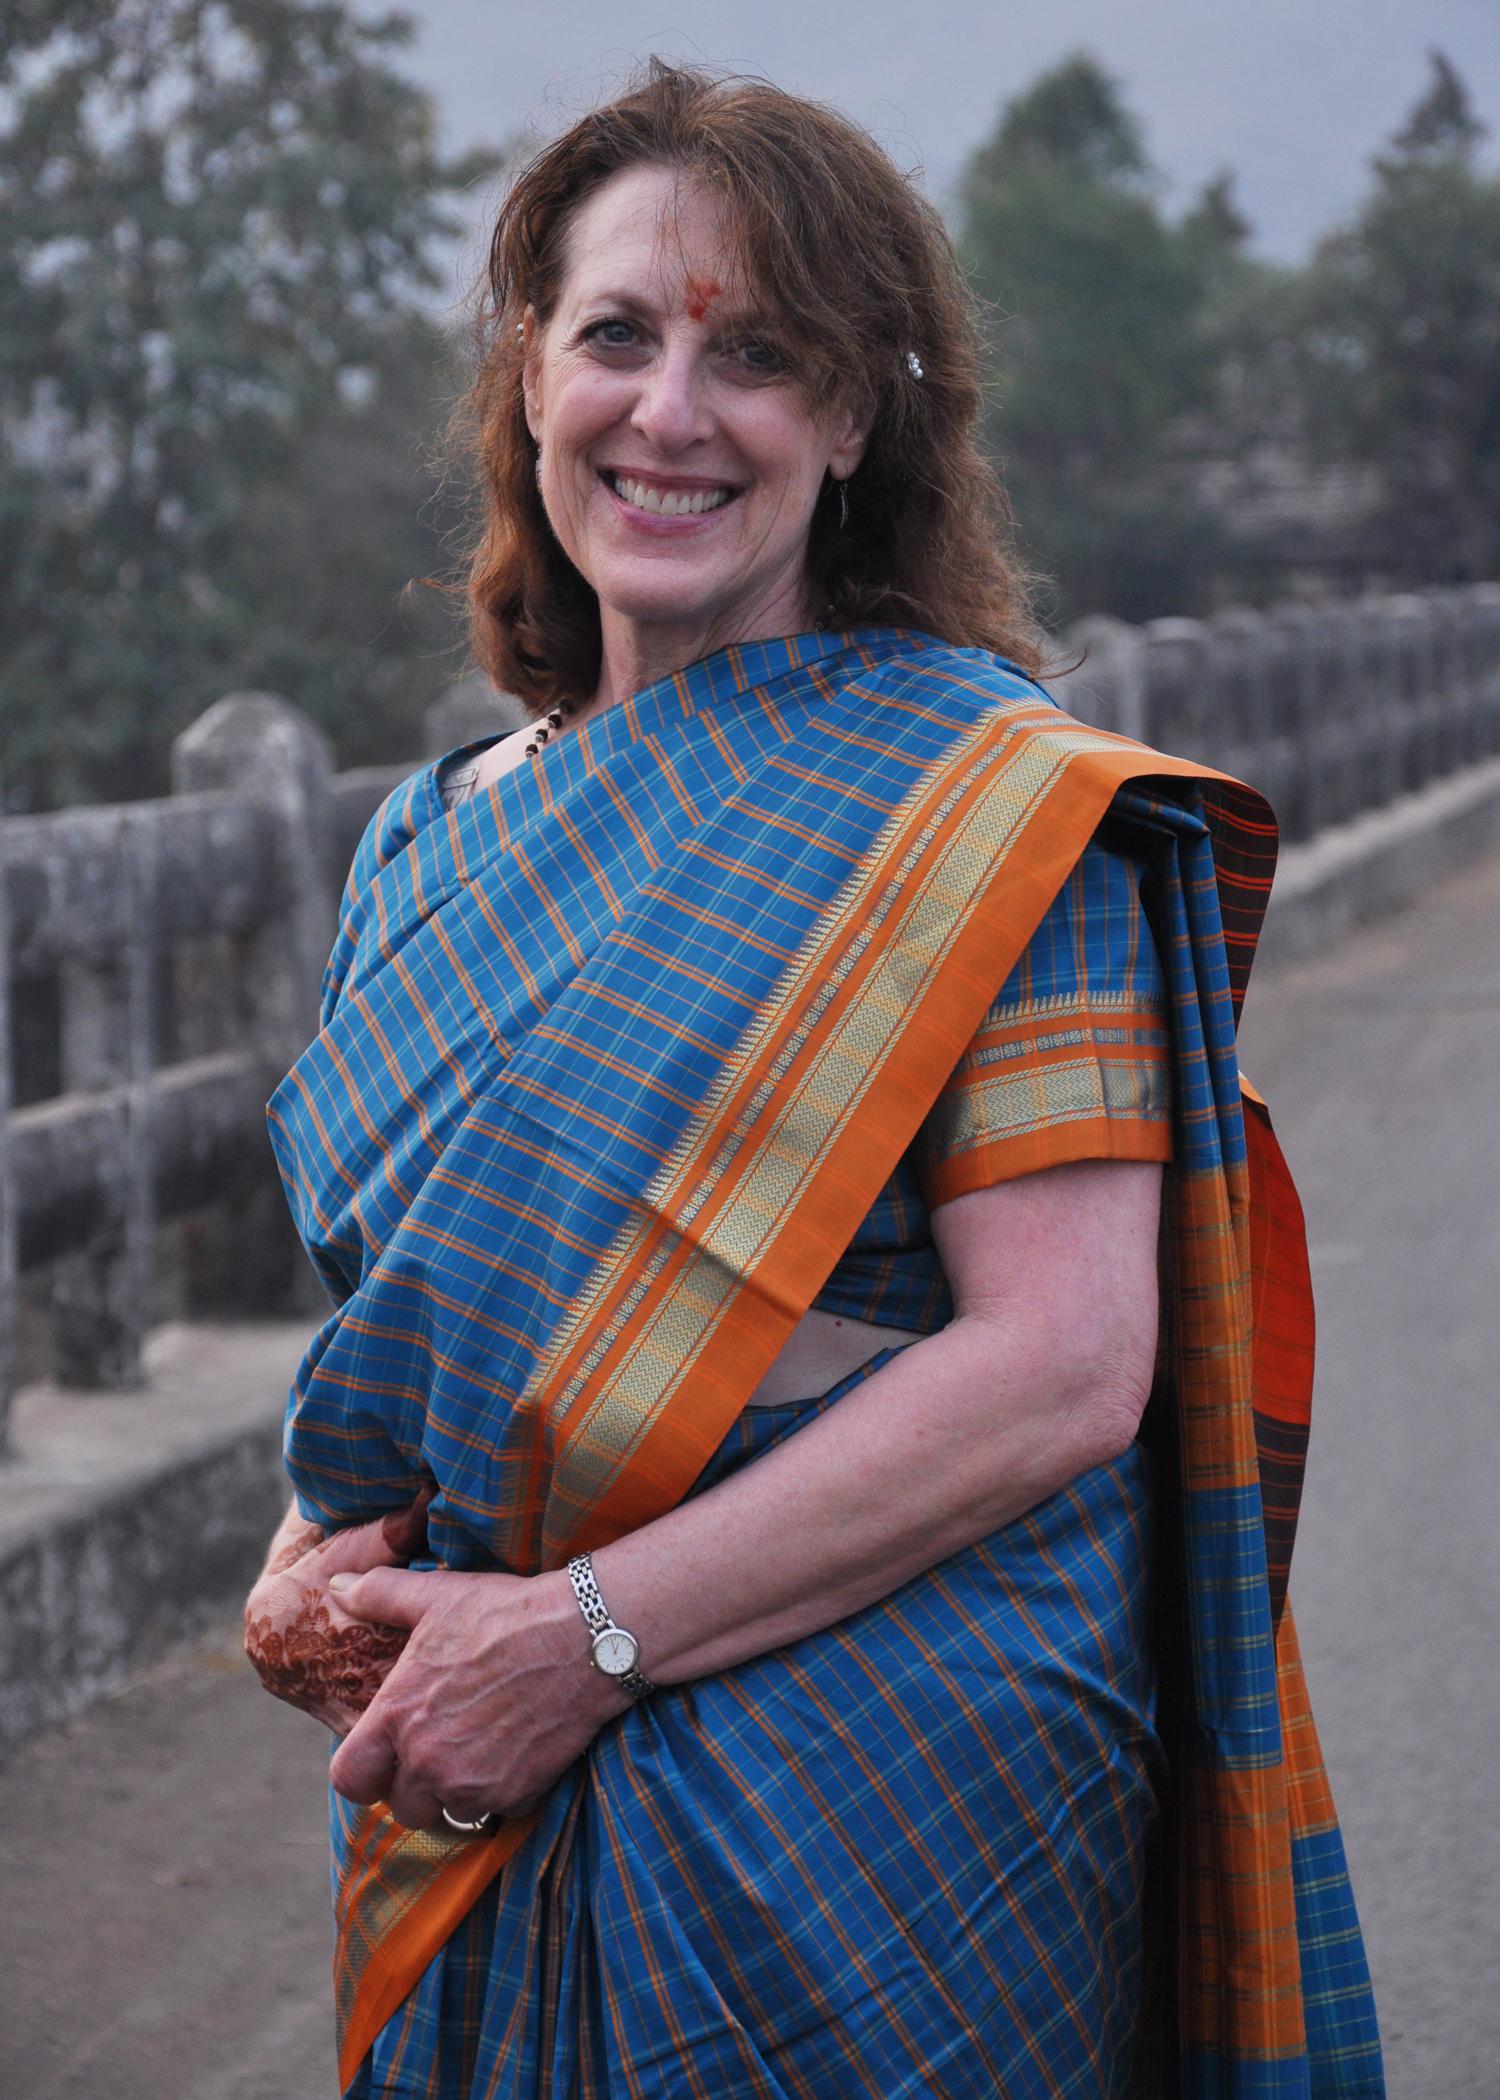 Visiting Gurudev Siddha Peeth By Sheynapurna Peace Sva Blog